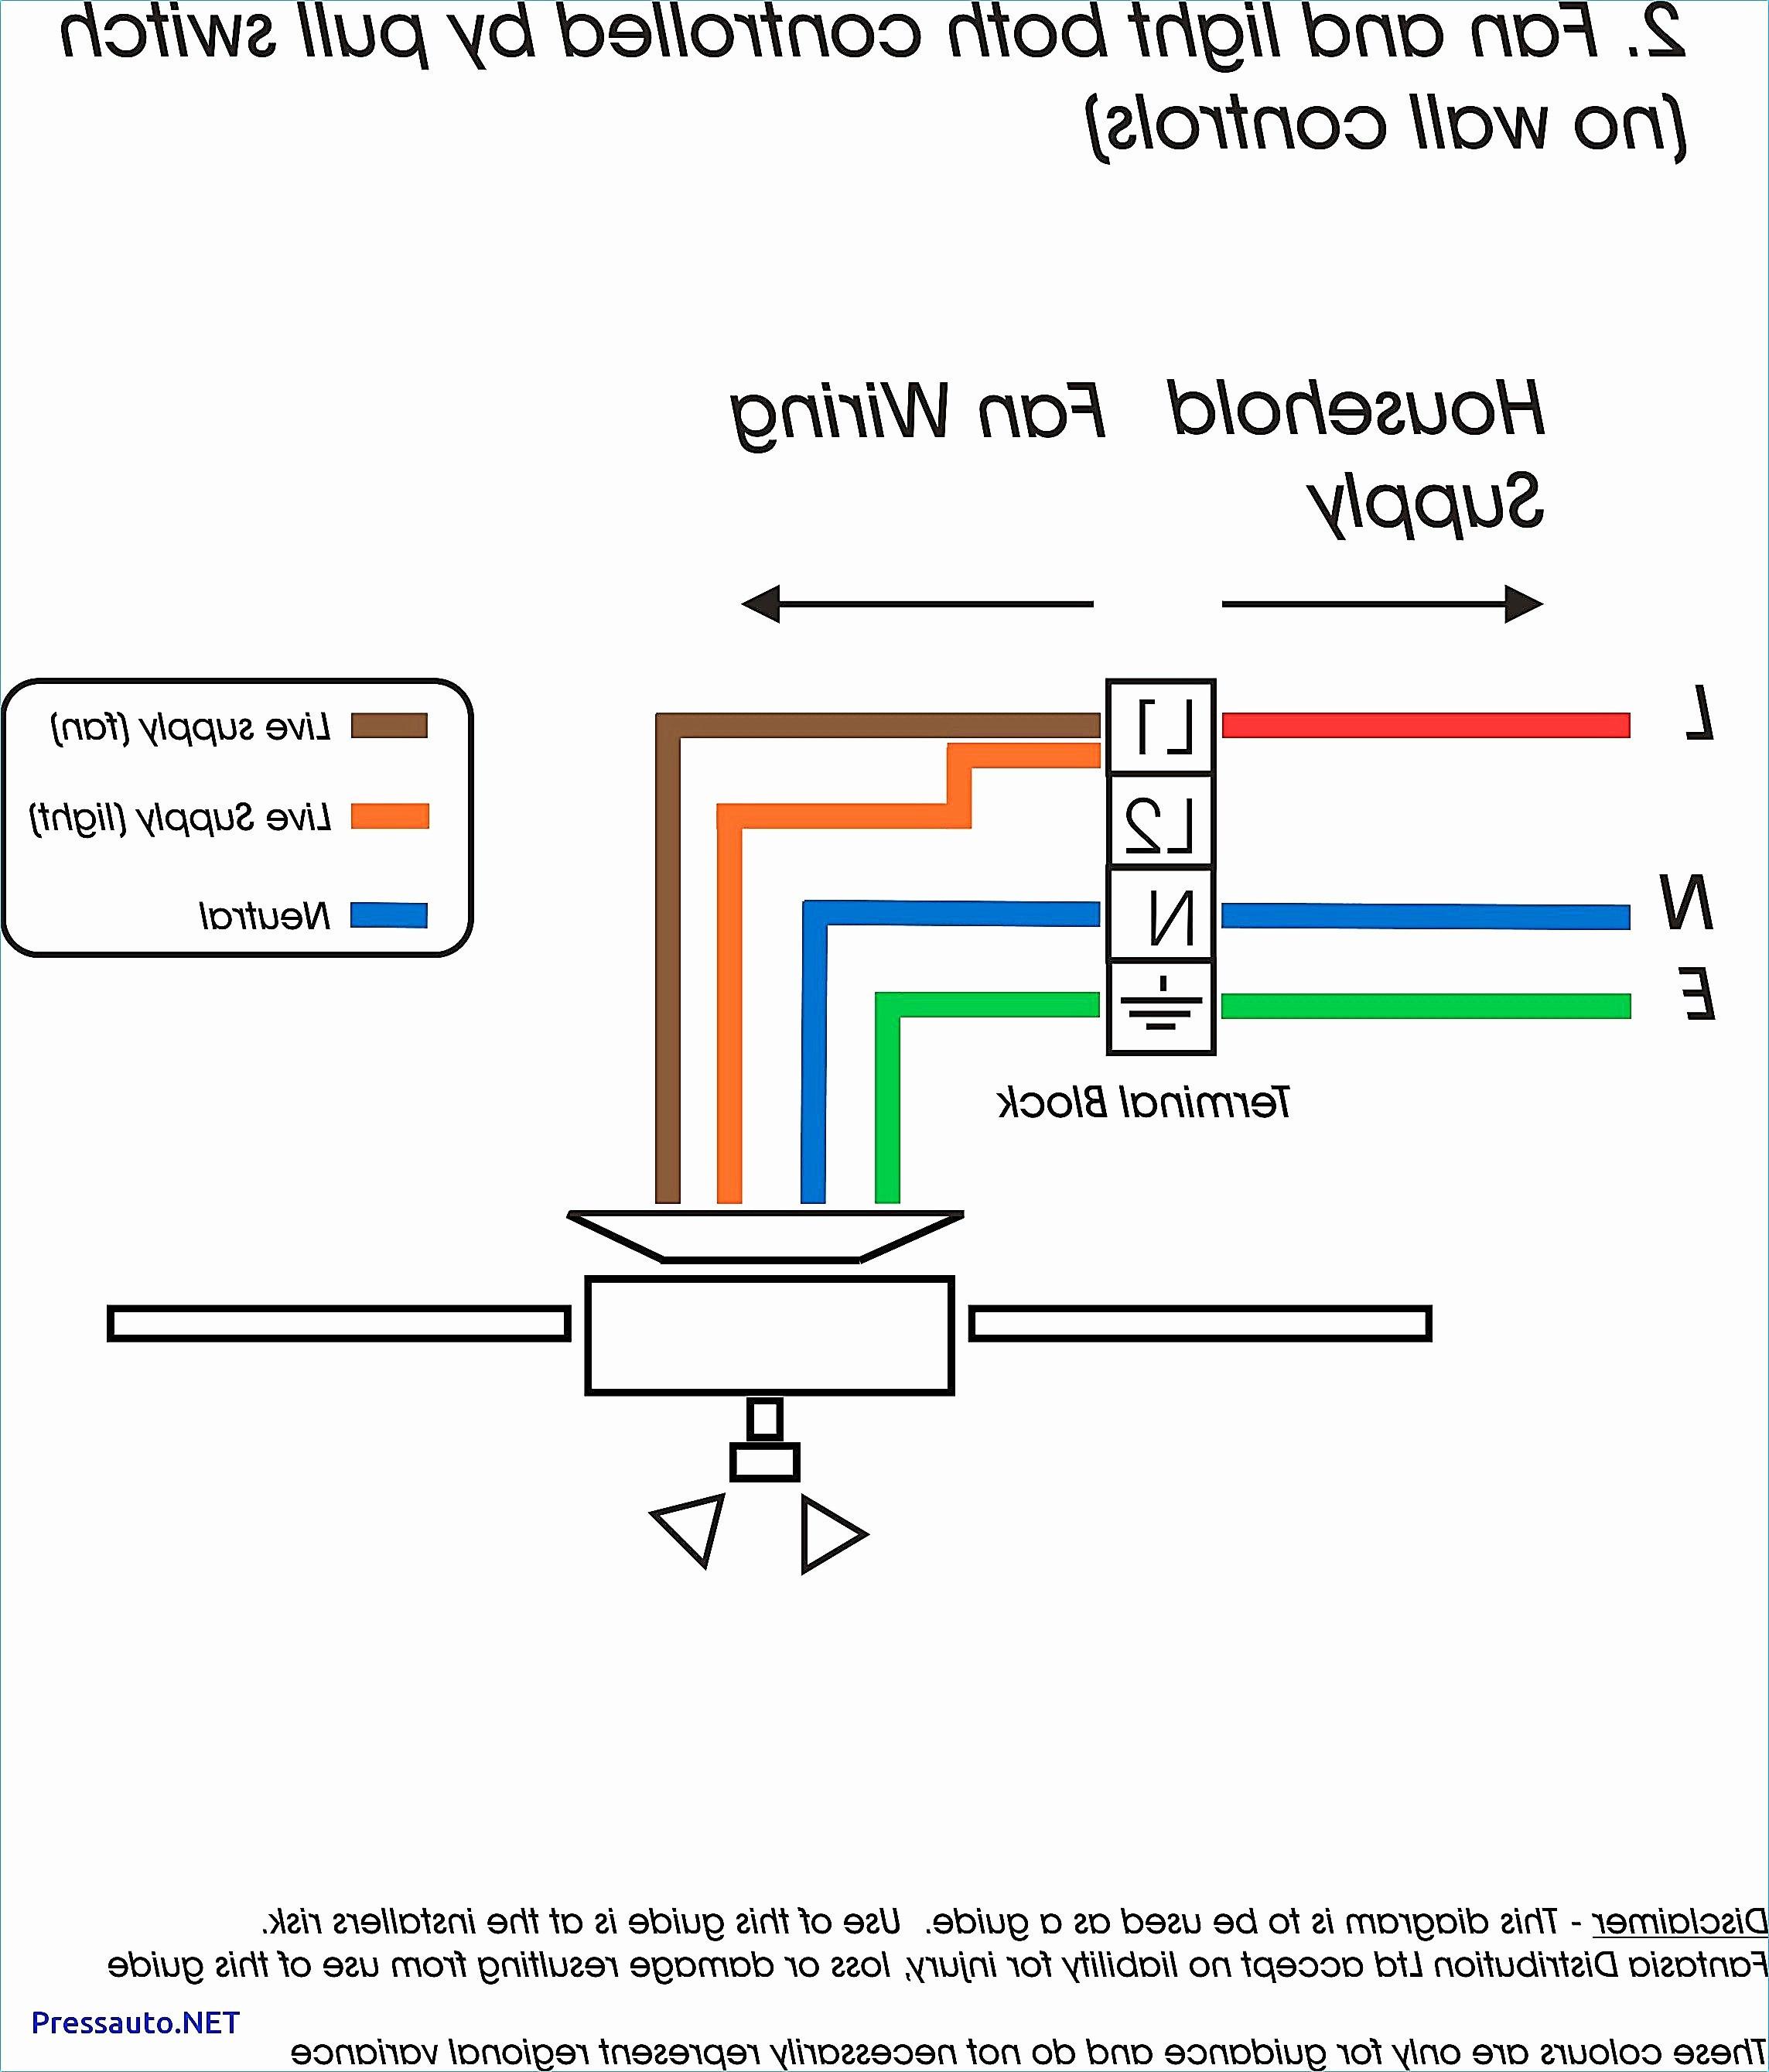 2007 toyota prius wiring diagram Download-2007 toyota Prius Wiring Diagram Wiring Diagram Central Lock Avanza New Download Wiring Diagram toyota 12-d